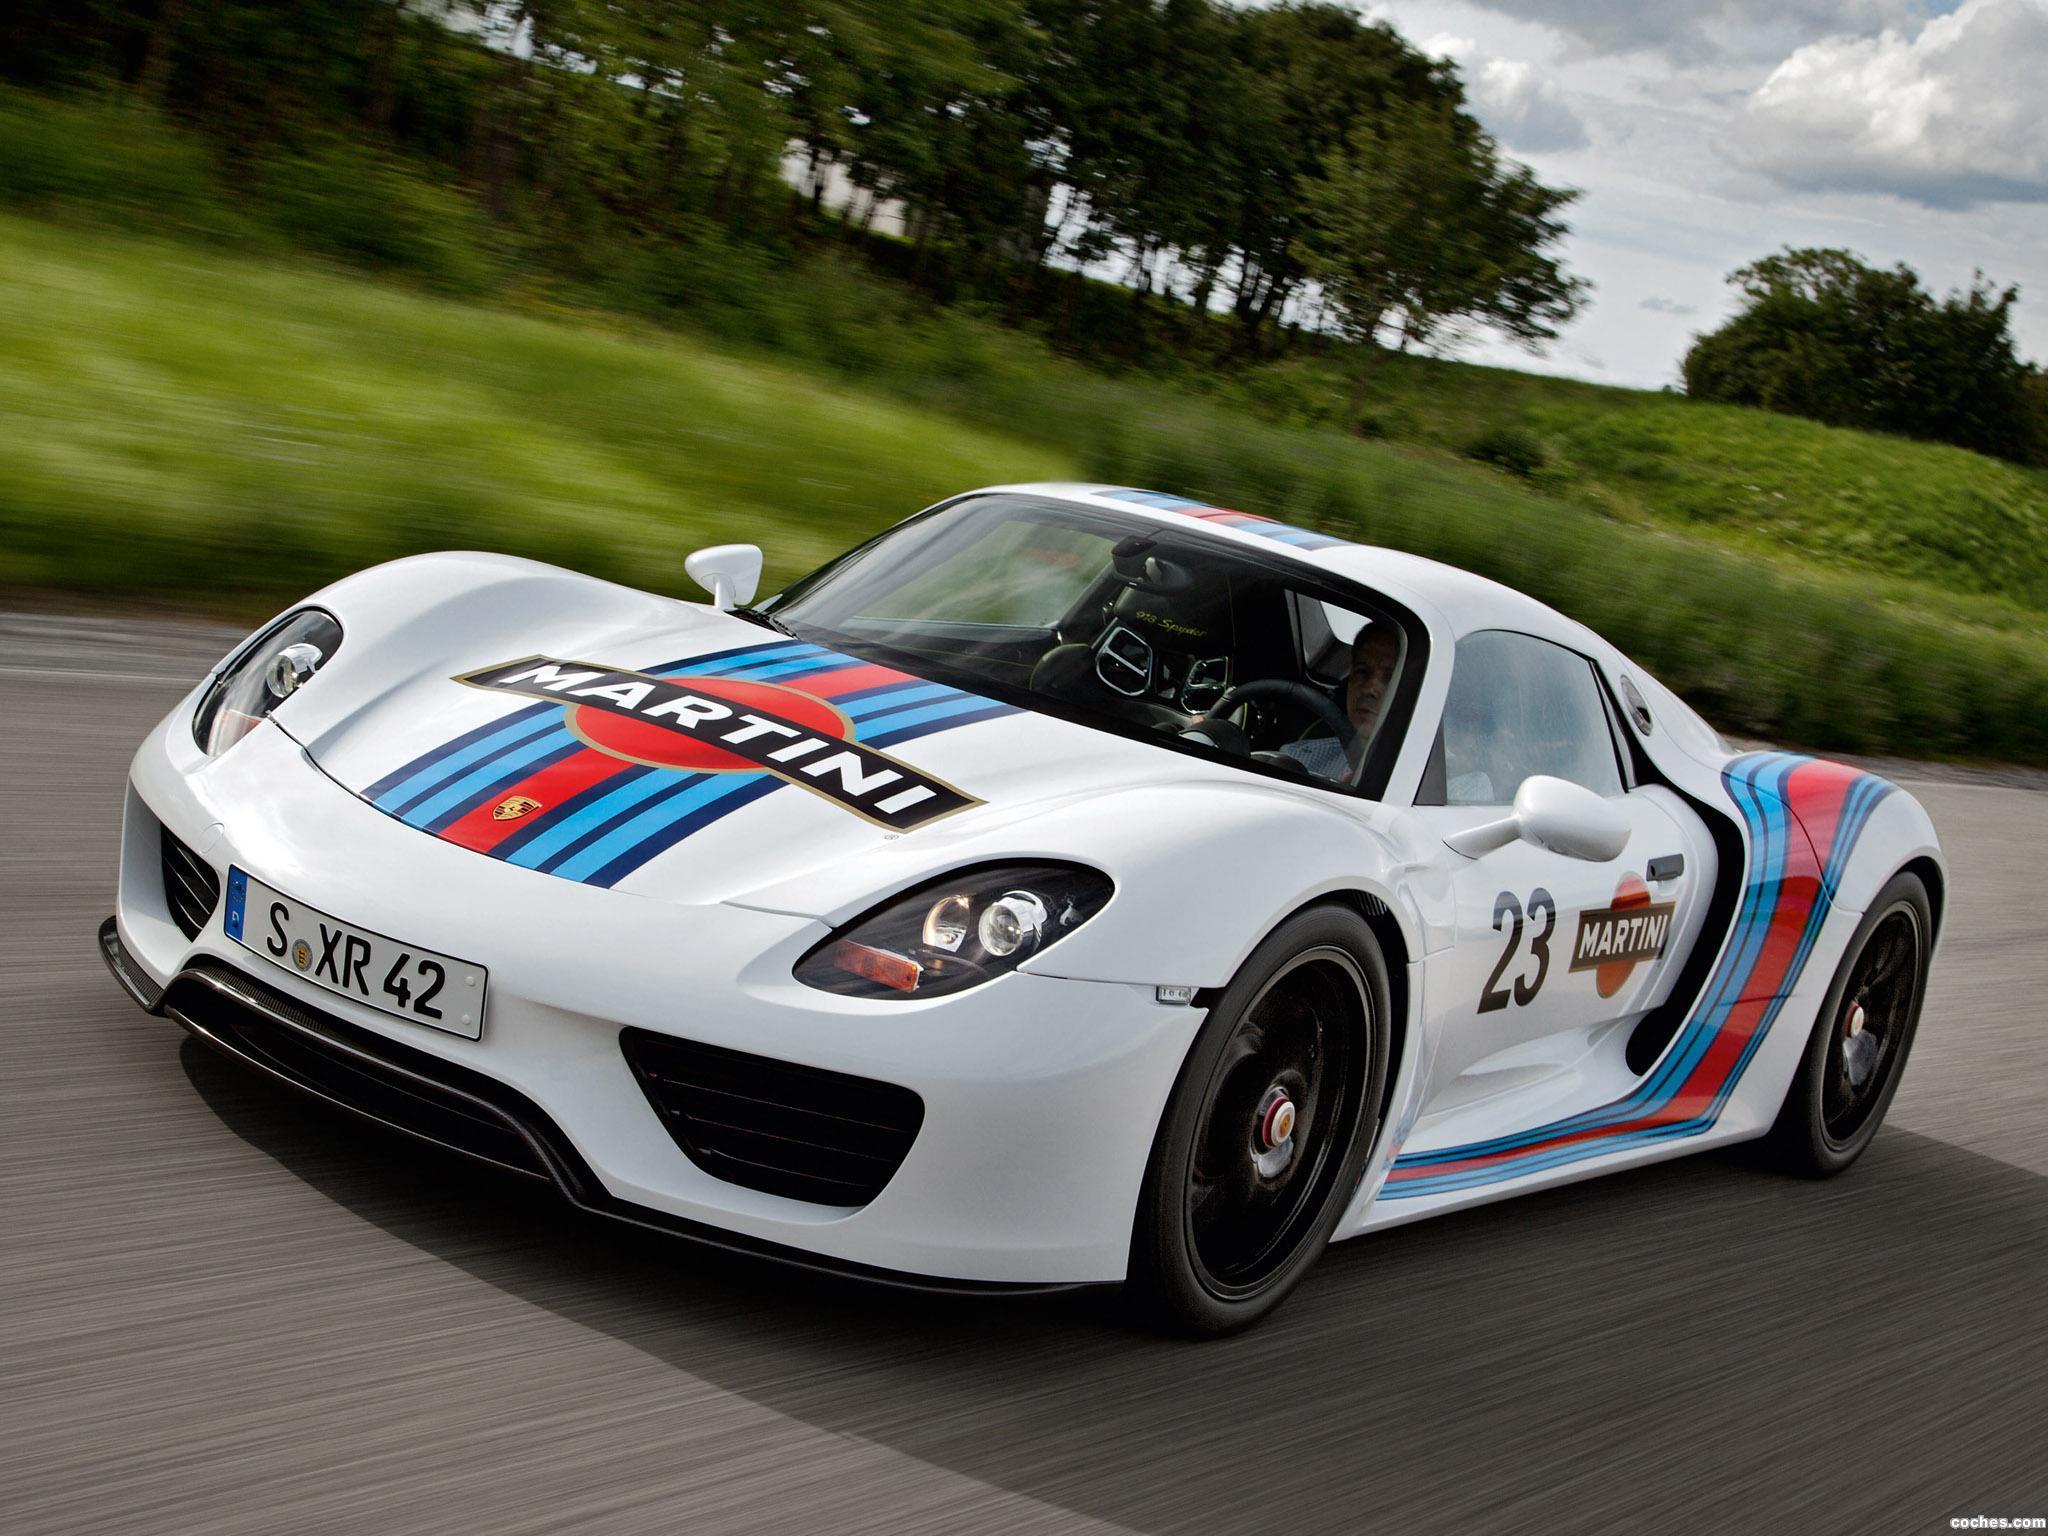 Foto 0 de Porsche 918 Spyder Prototype Martini Racing Design 2012